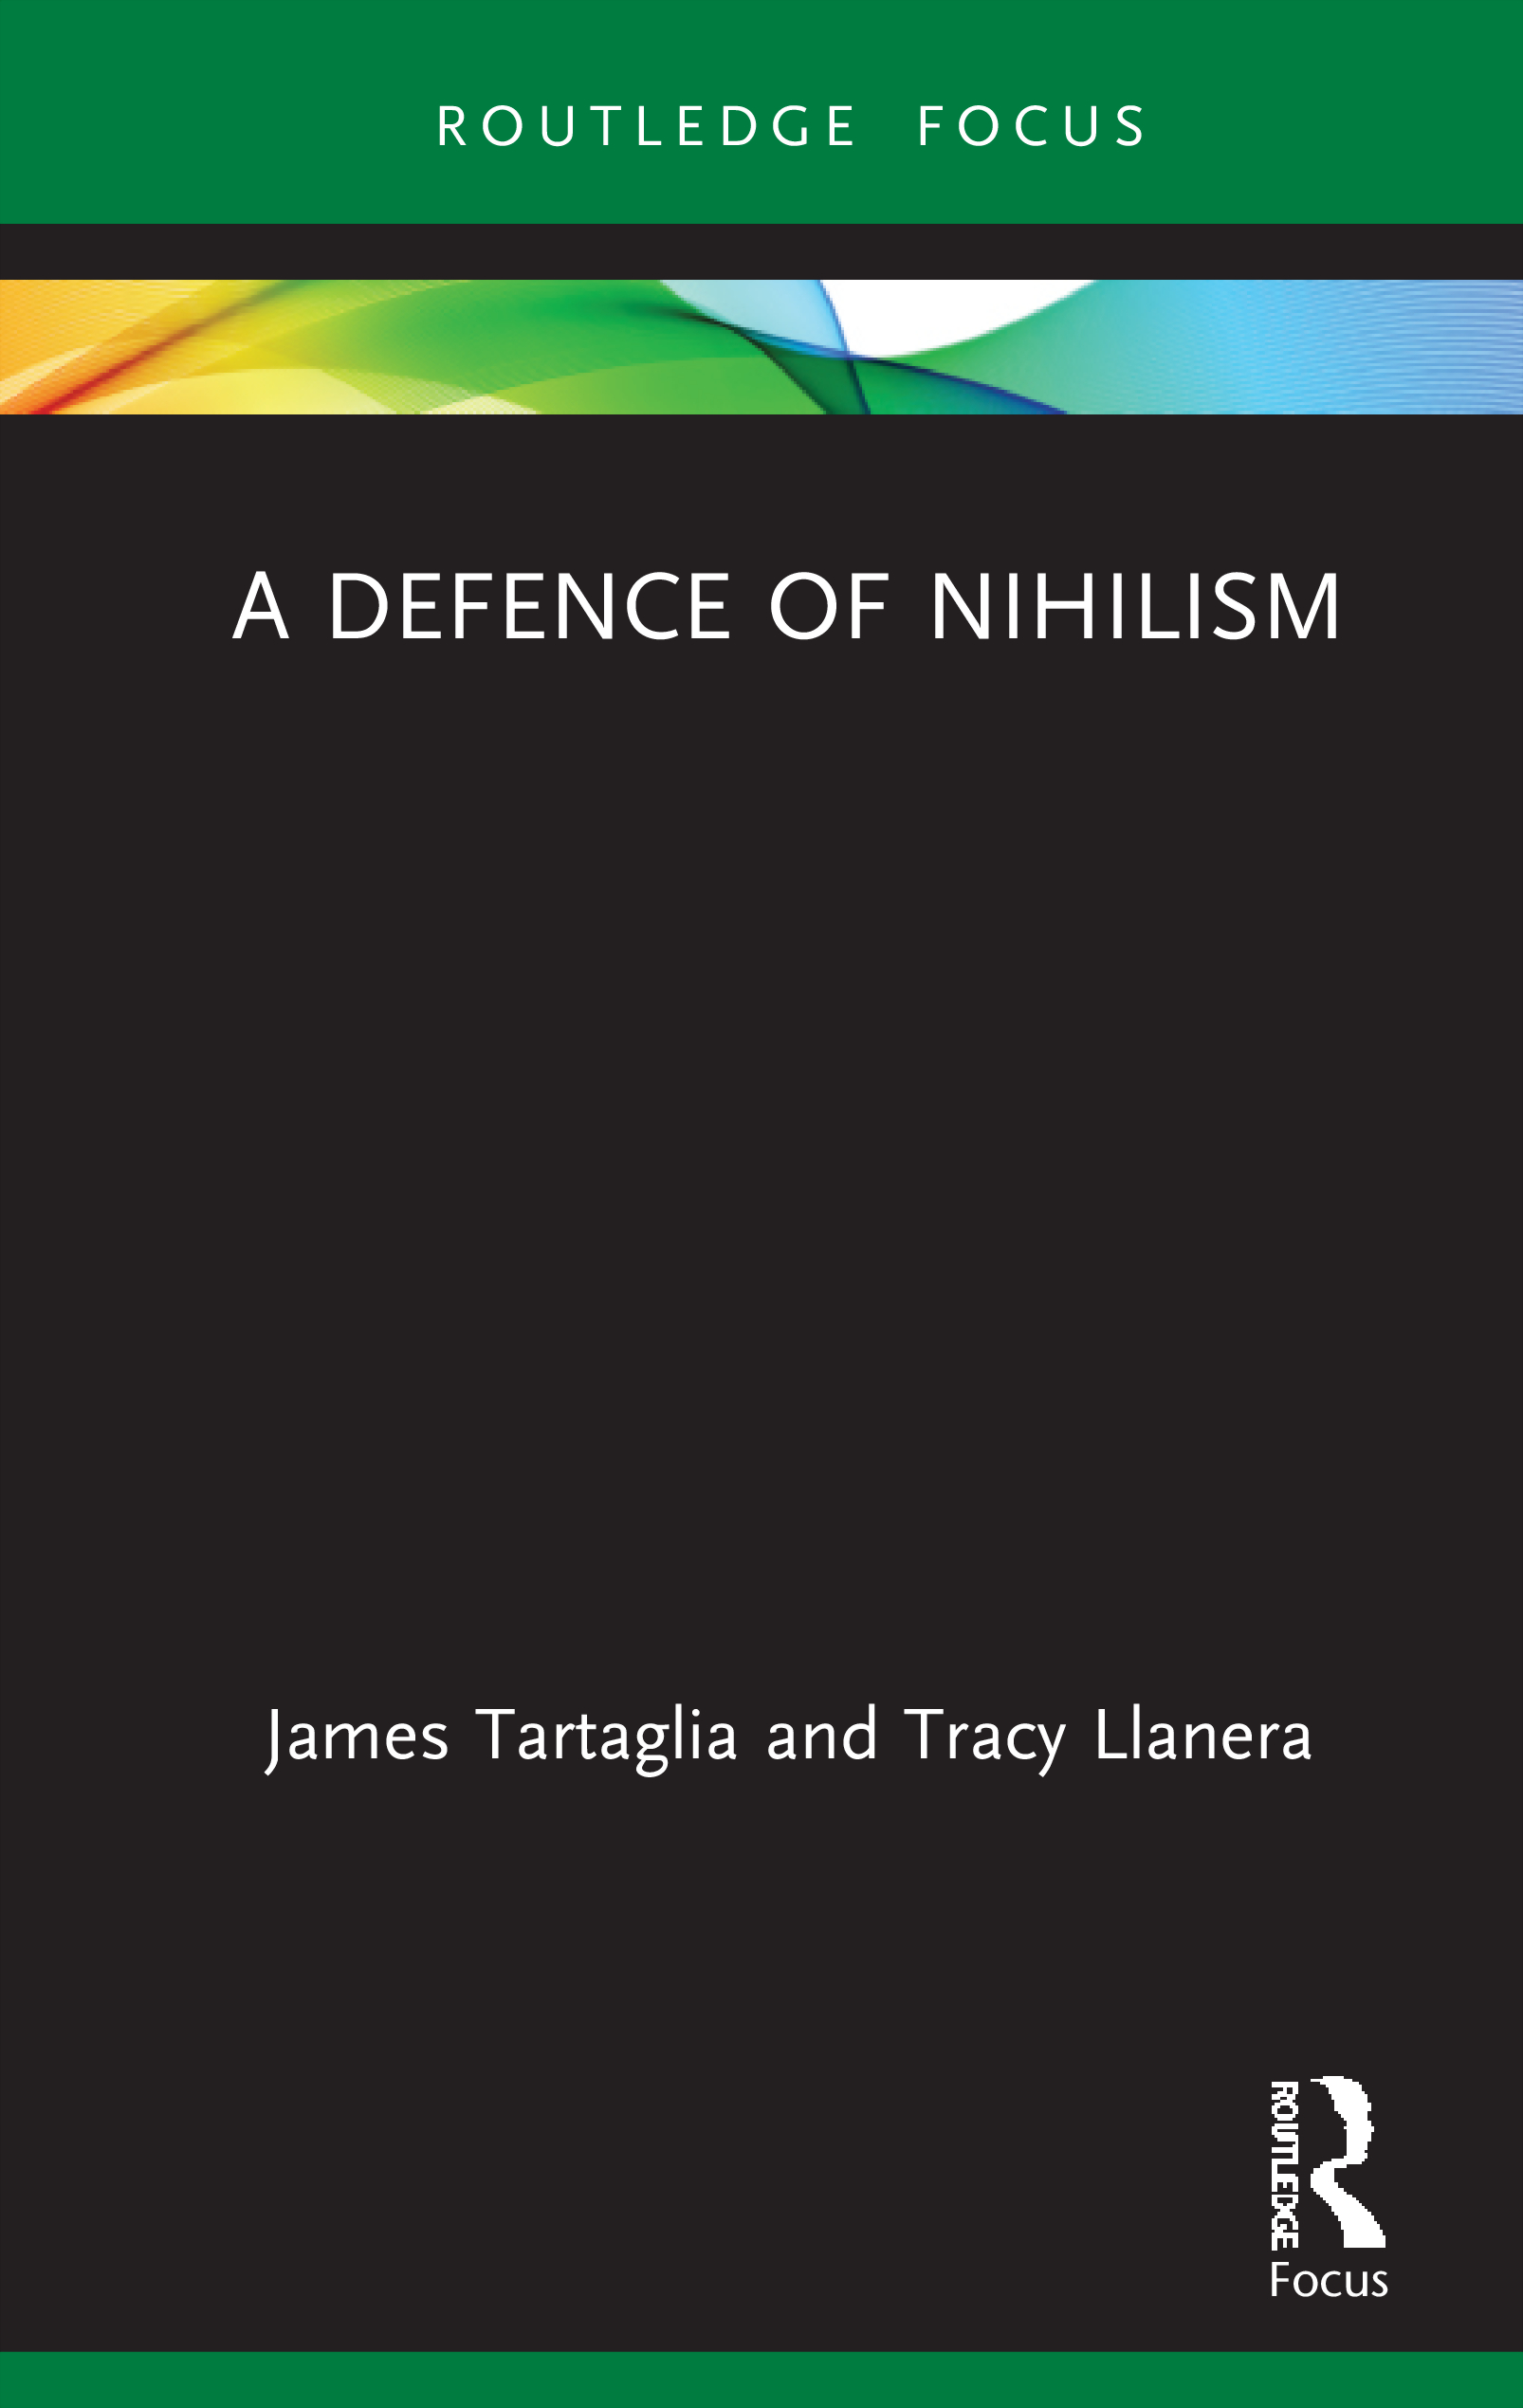 A Brief History of Nihilism